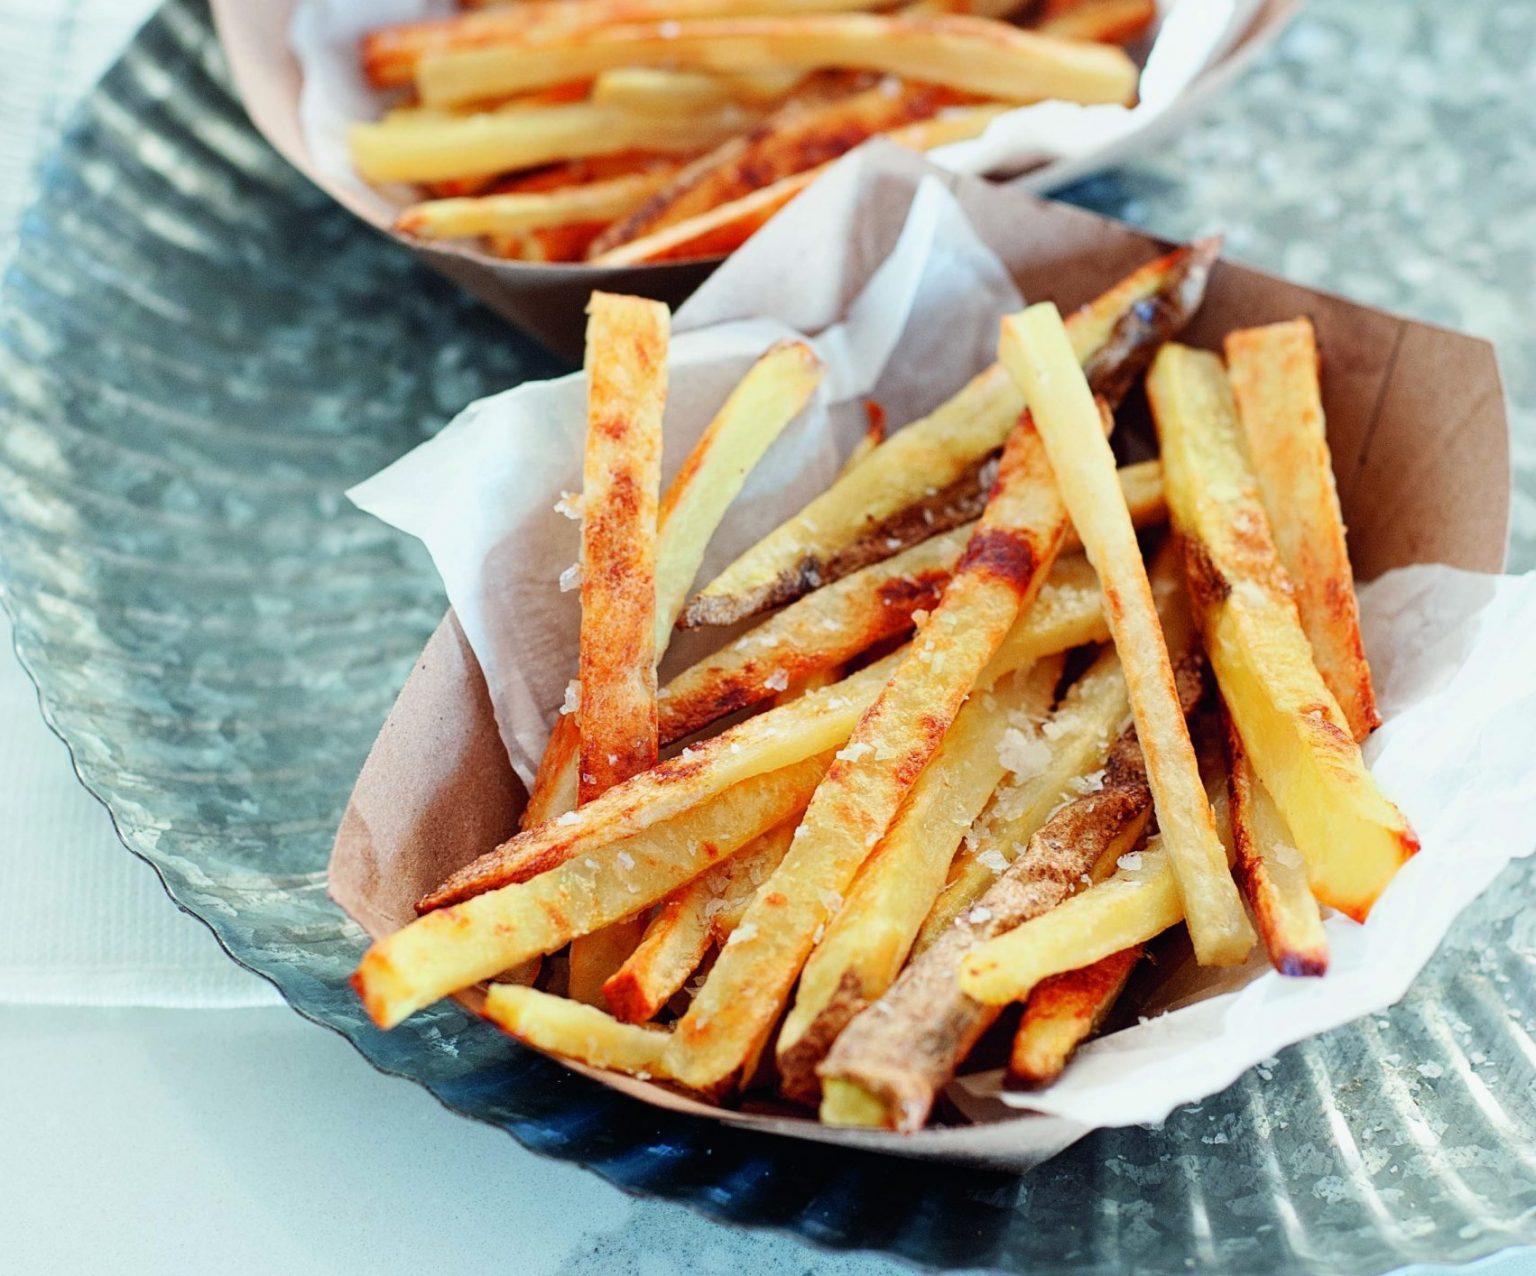 Vegan Crispy Baked Garlic French Fries